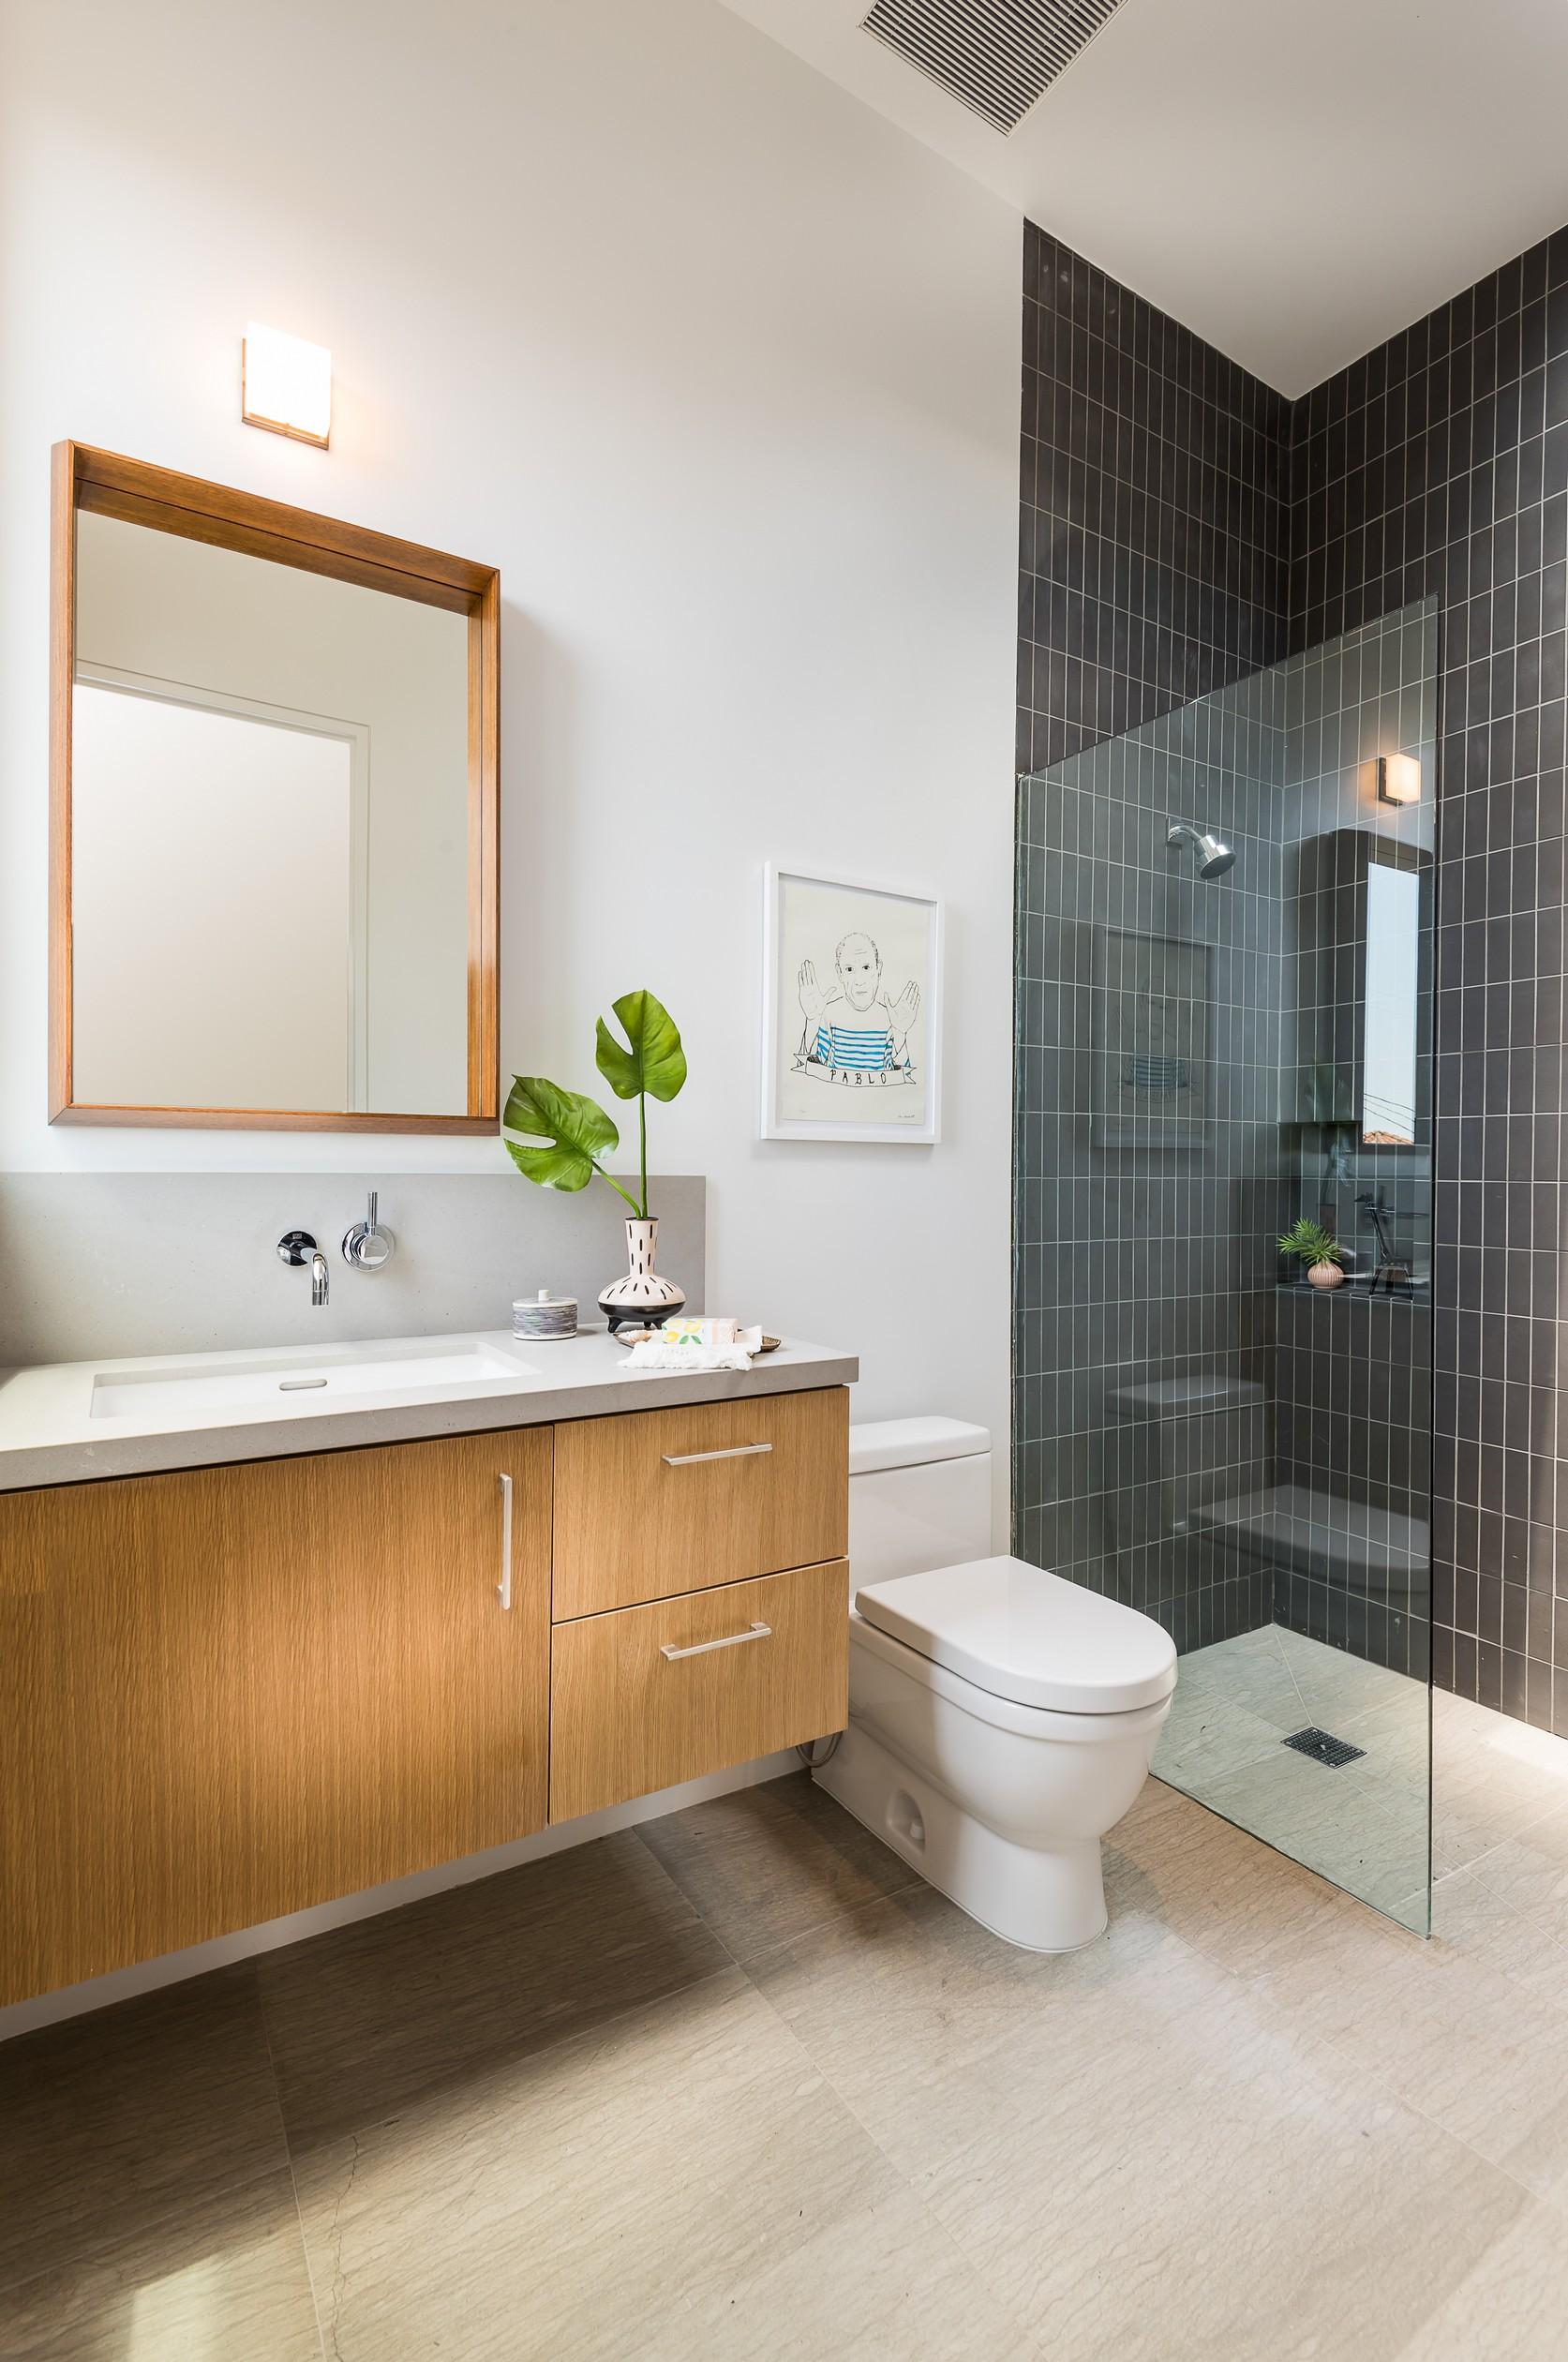 1265 Rimmer,Pacific Palisades,California 90272,5 Bedrooms Bedrooms,6.5 BathroomsBathrooms,Home,Rimmer,1046